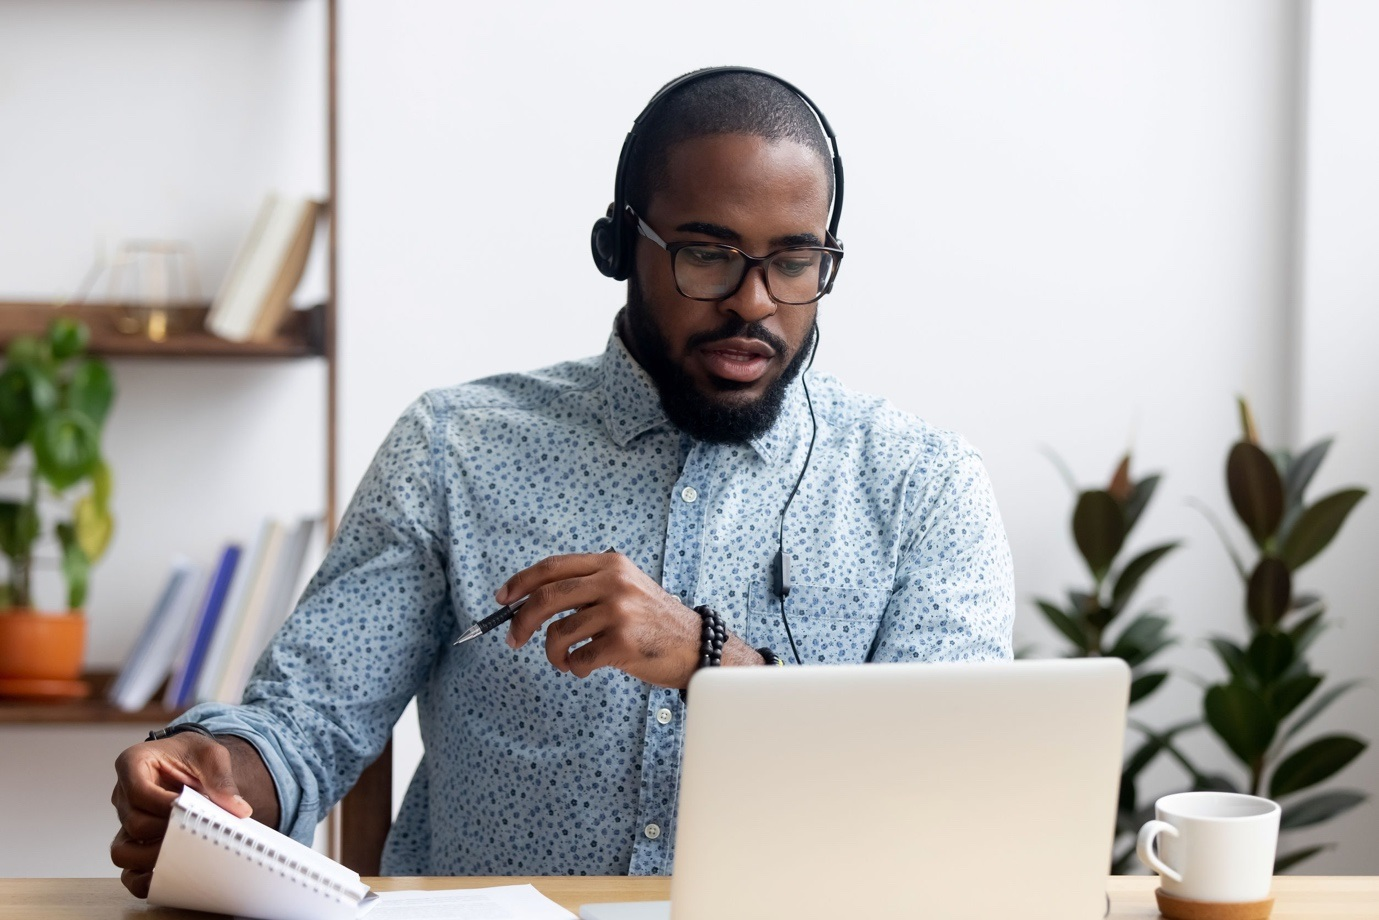 Online study can help achieve a work-life balance